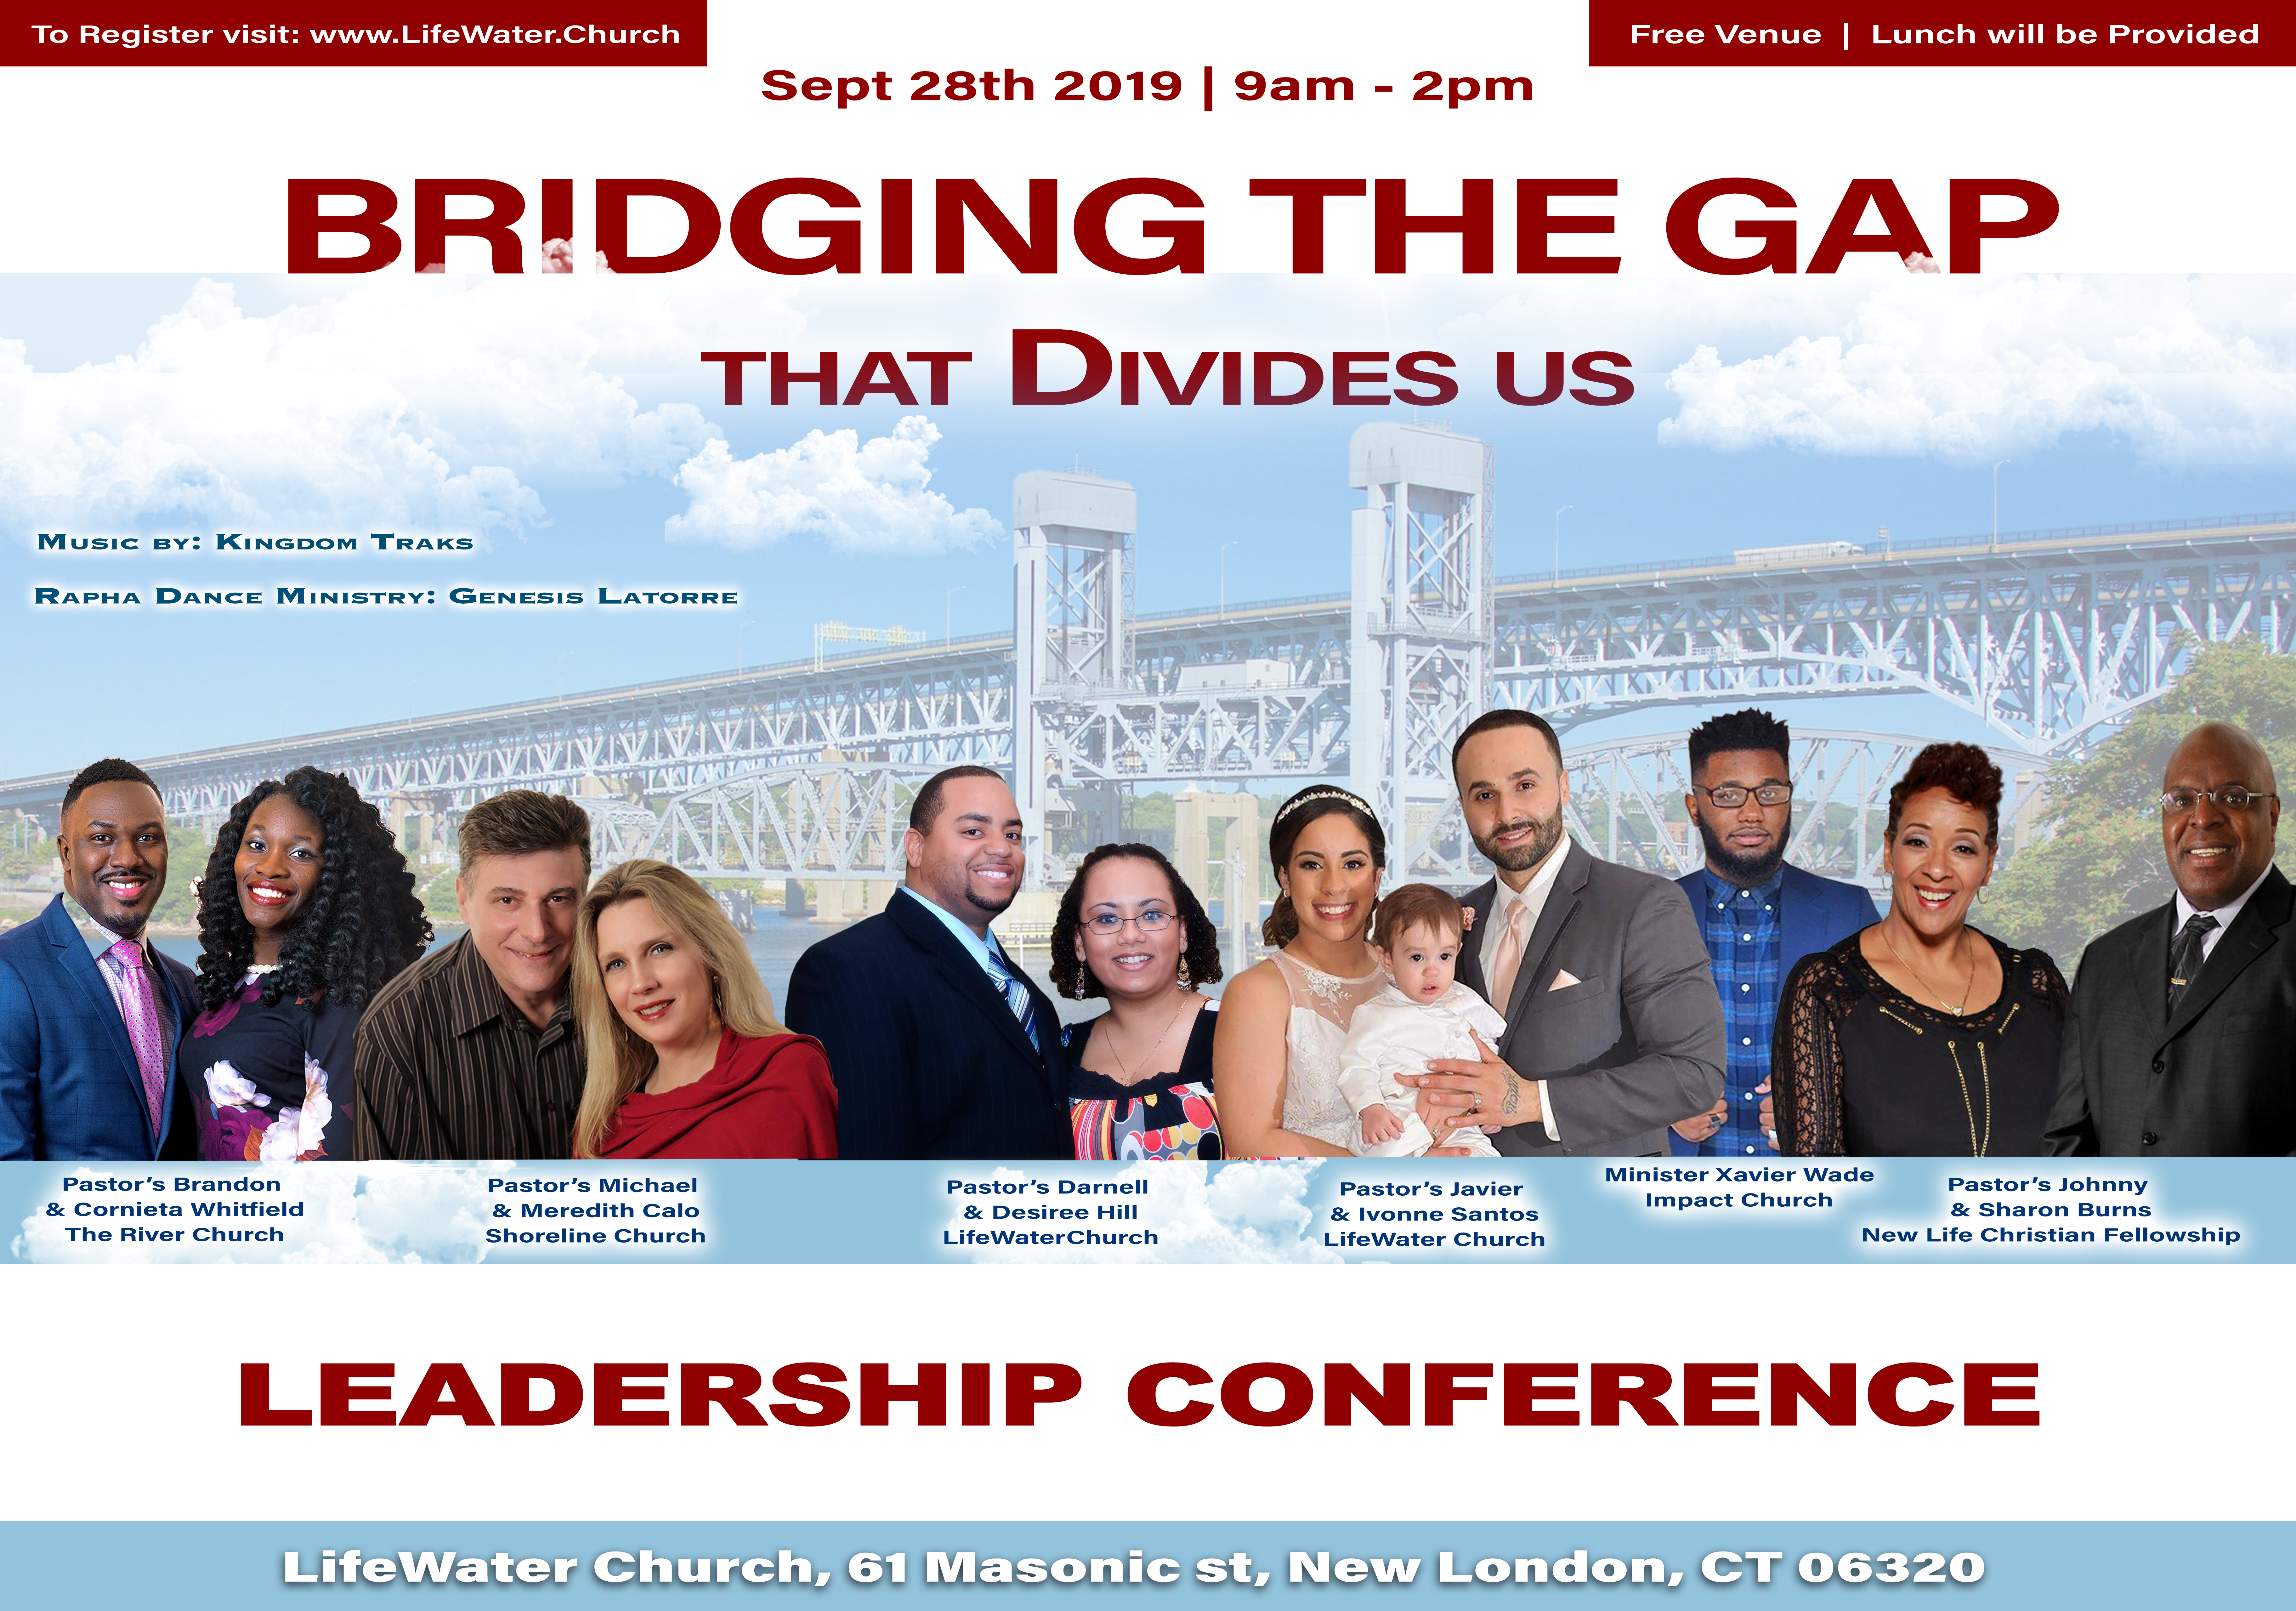 Bridging the Gap that Divides us (Leadership Conference) Lifewater Church